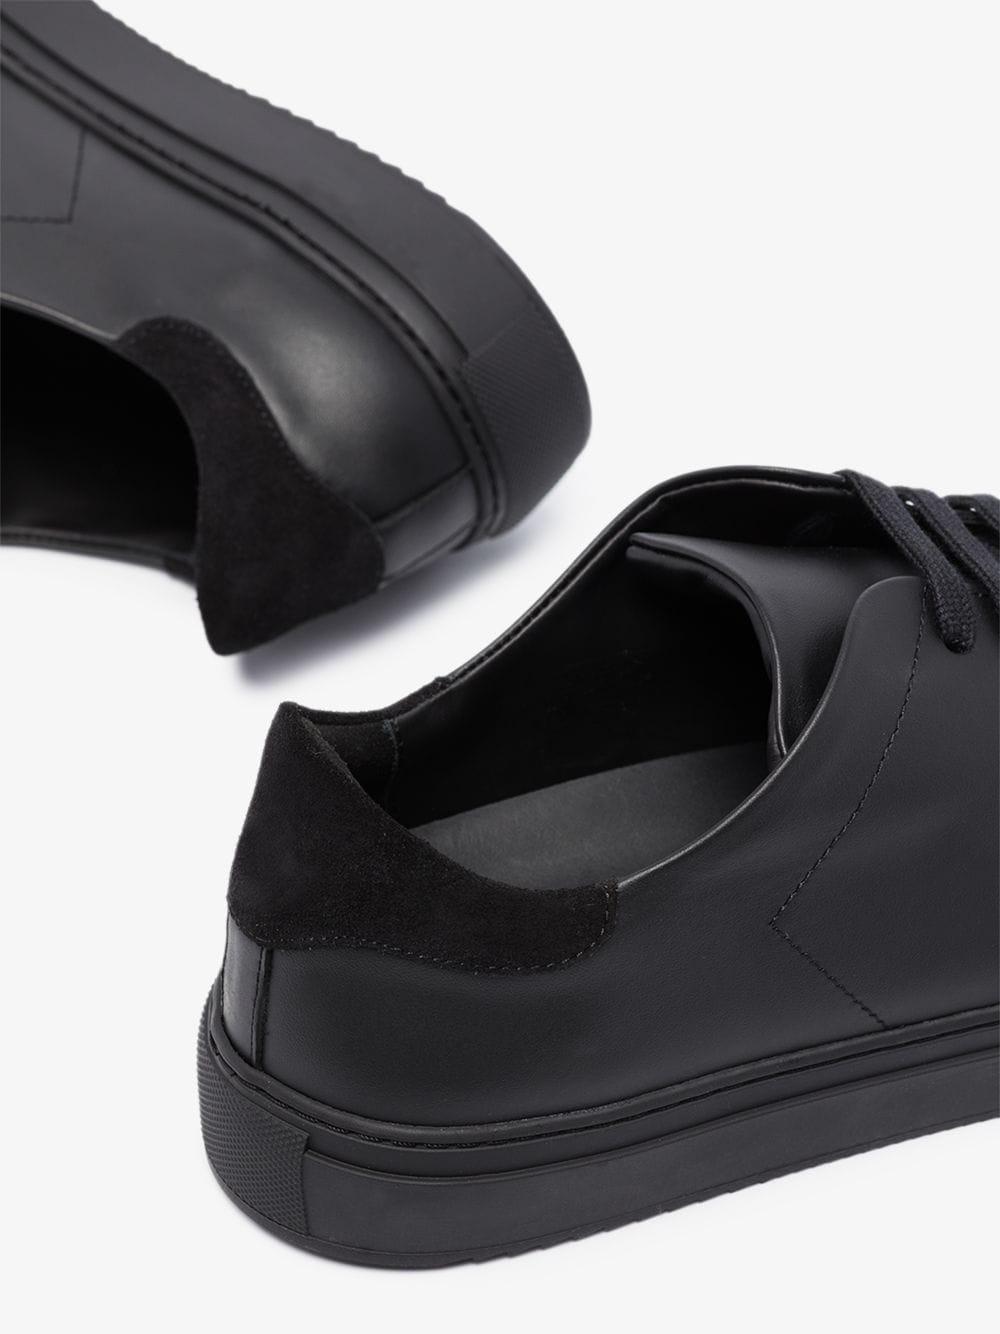 clean 90 sneakers man black in leather AXEL ARIGATO   Sneakers   28116BLACK